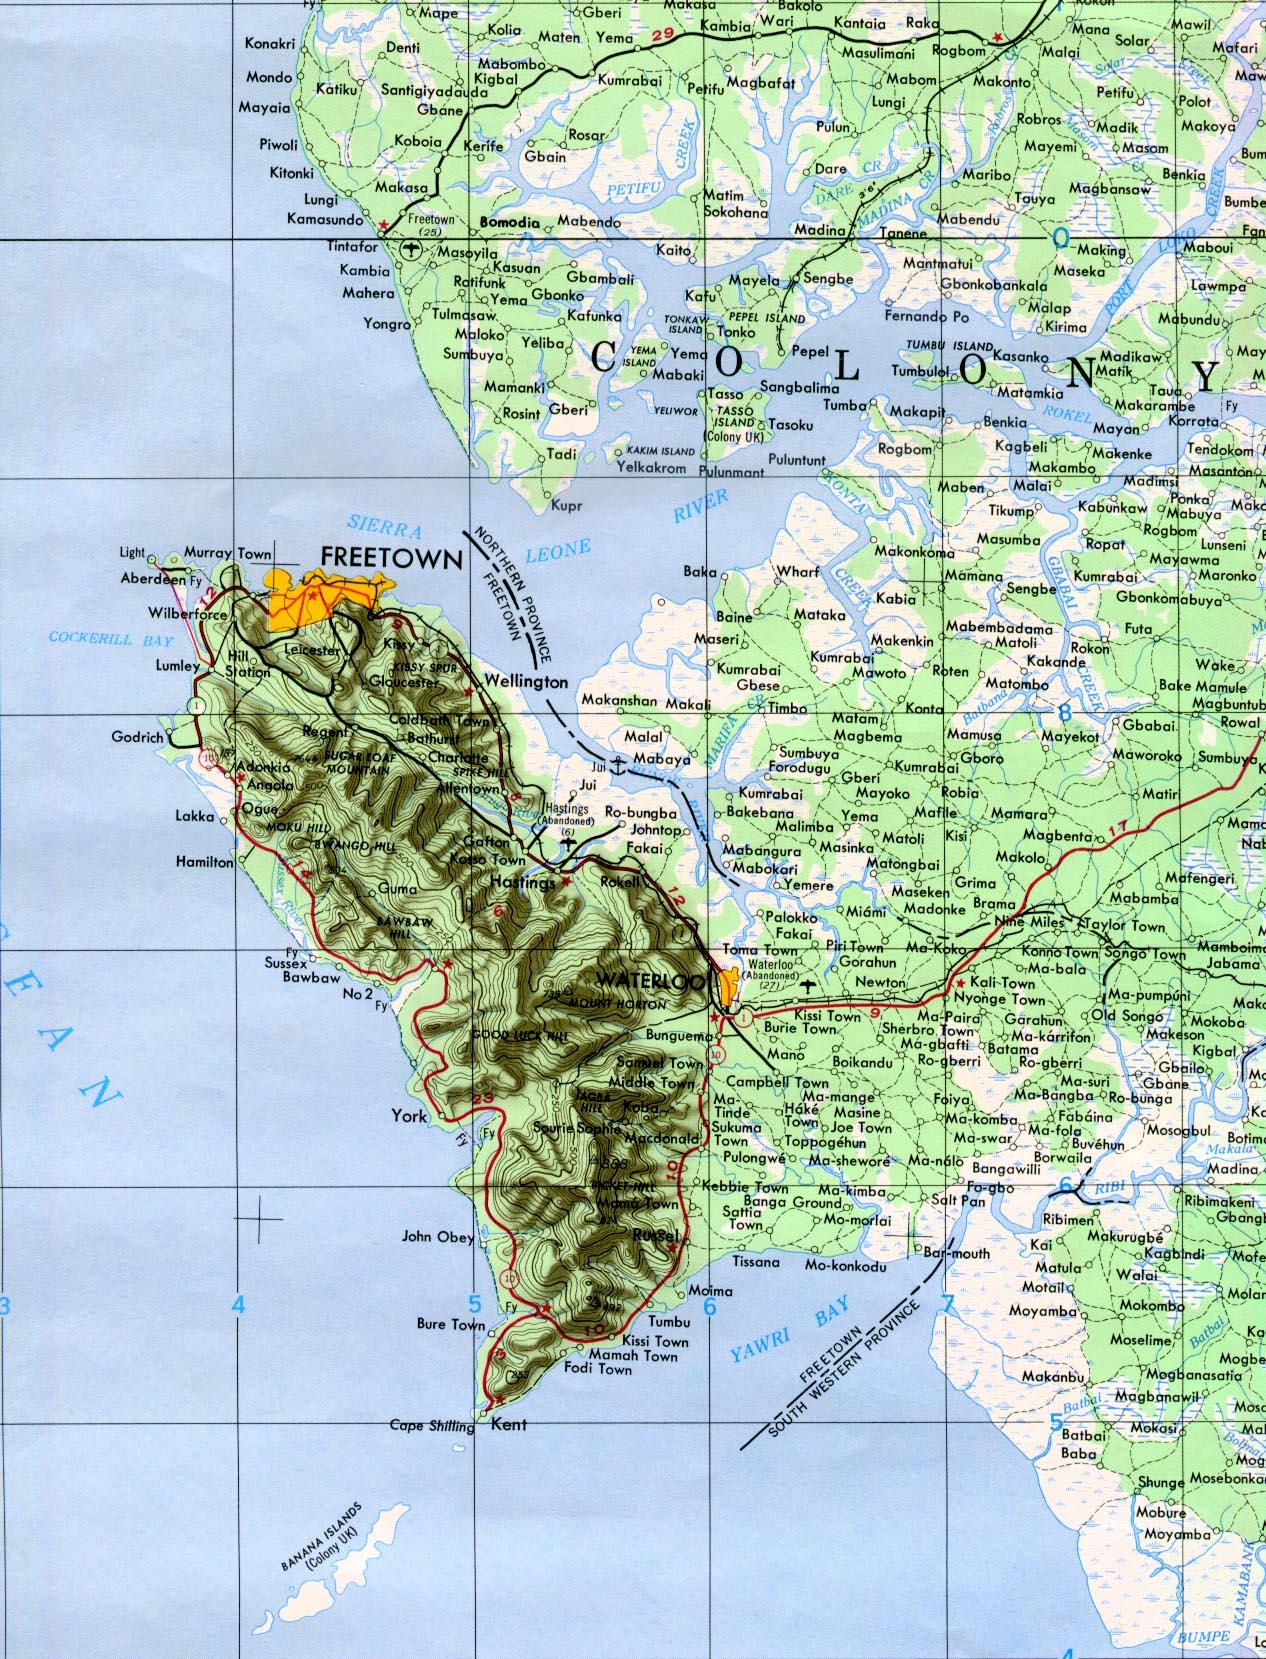 Mapa Topográfico de la Región de Freetown, Sierra Leona 1958